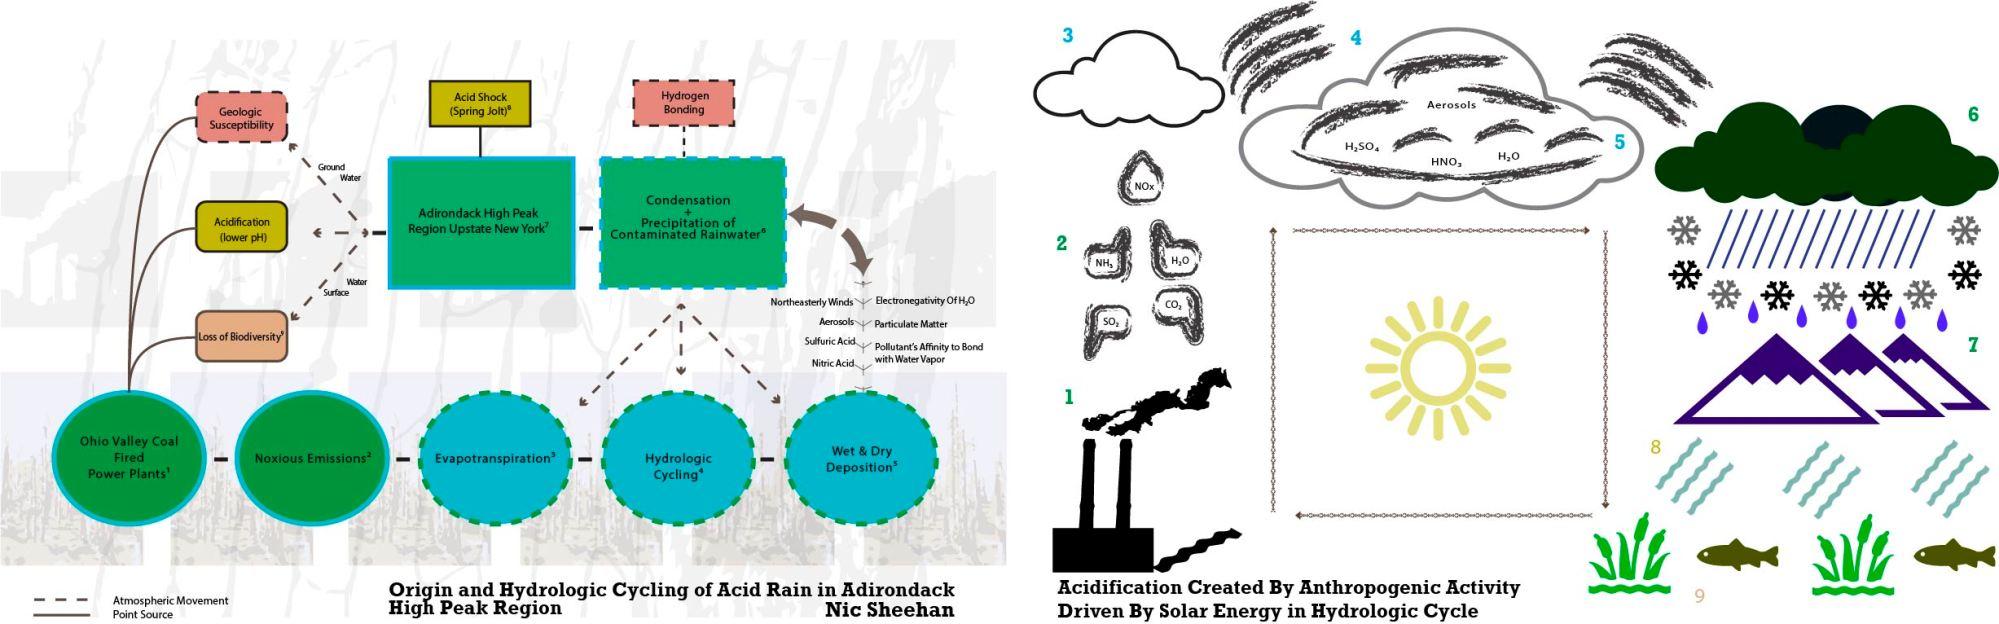 hight resolution of nic sheehan acid rain in adirondacks